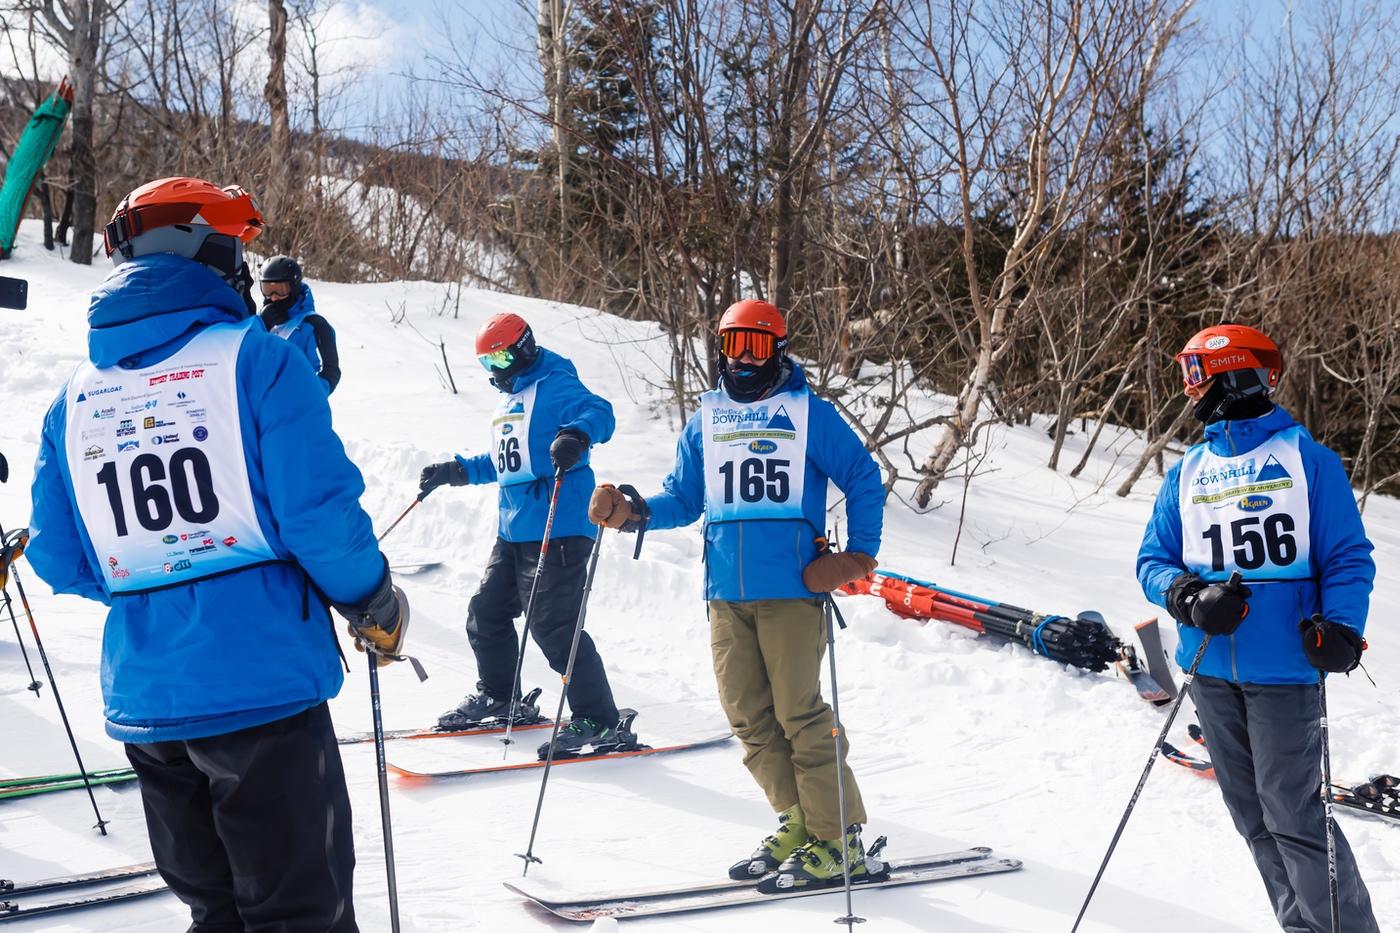 WinterKids Downhill 24 2021 SDP 3338